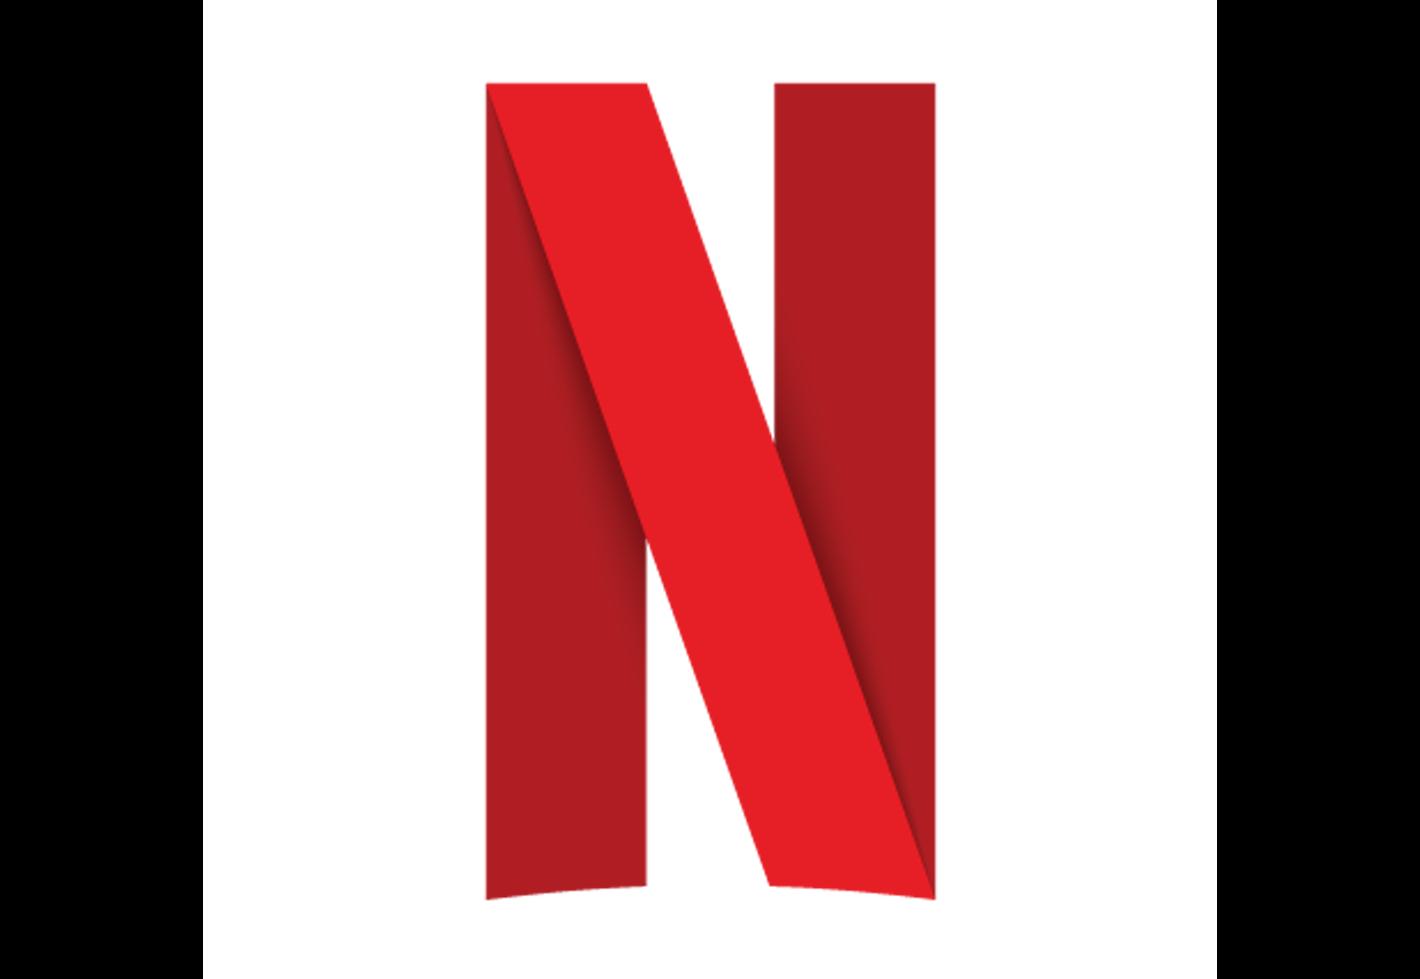 crop-667-460-1420-979-0-Netflix_N_logo.png